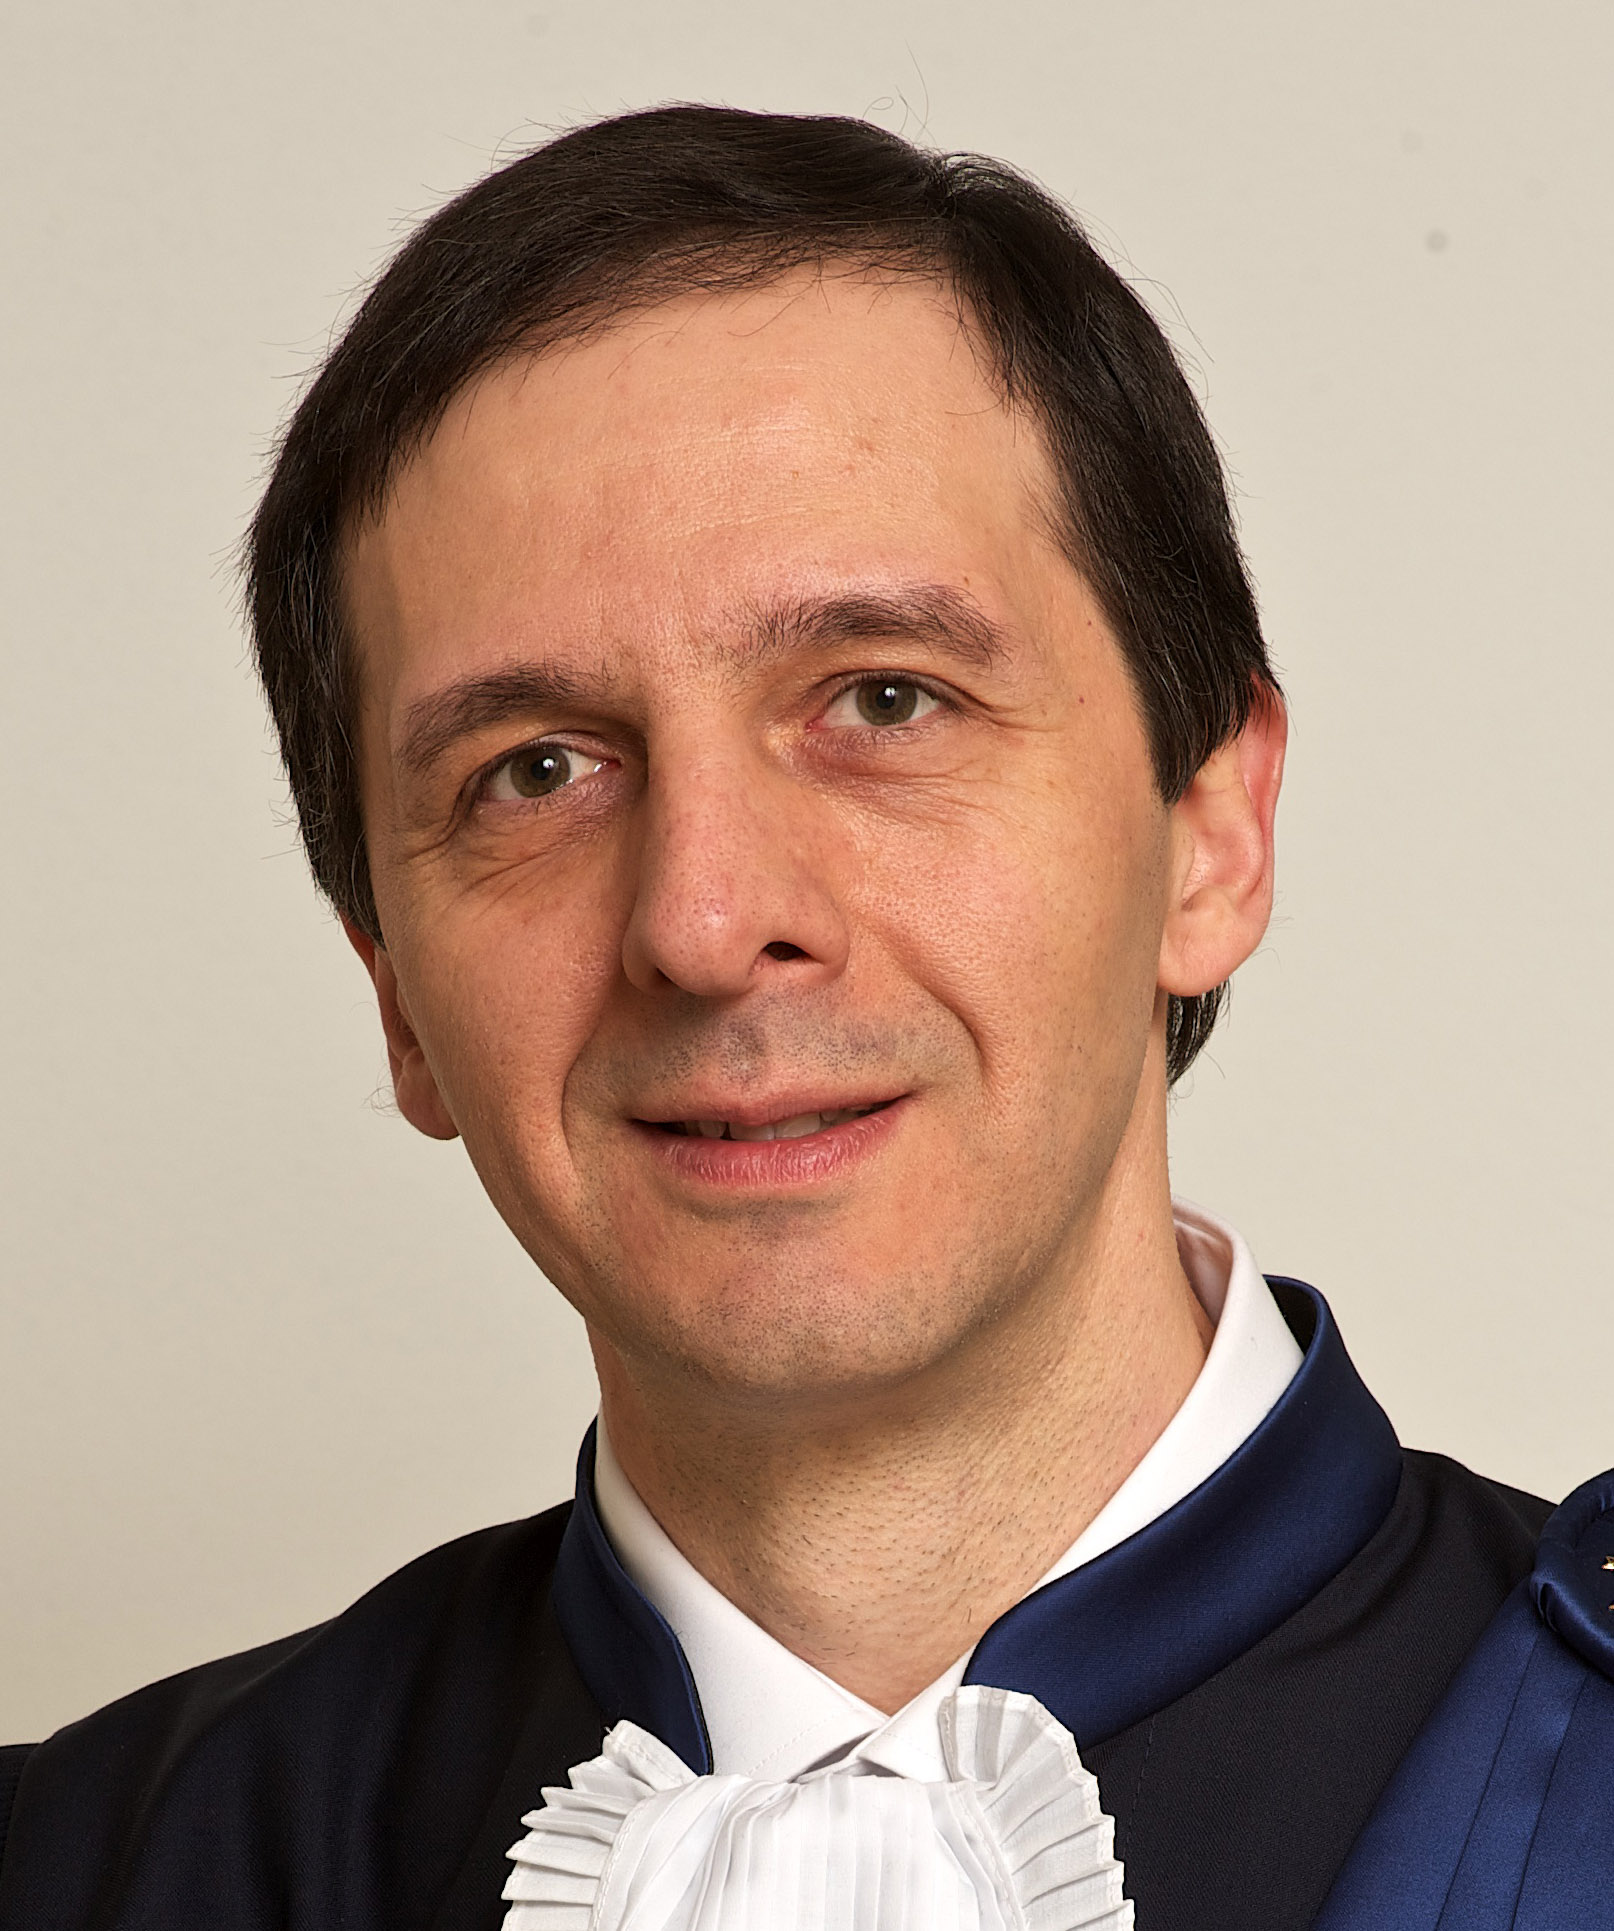 ECHR Judge Dmitri Dedov (Photo courtesy of the Estonian Institute of Human Rights)